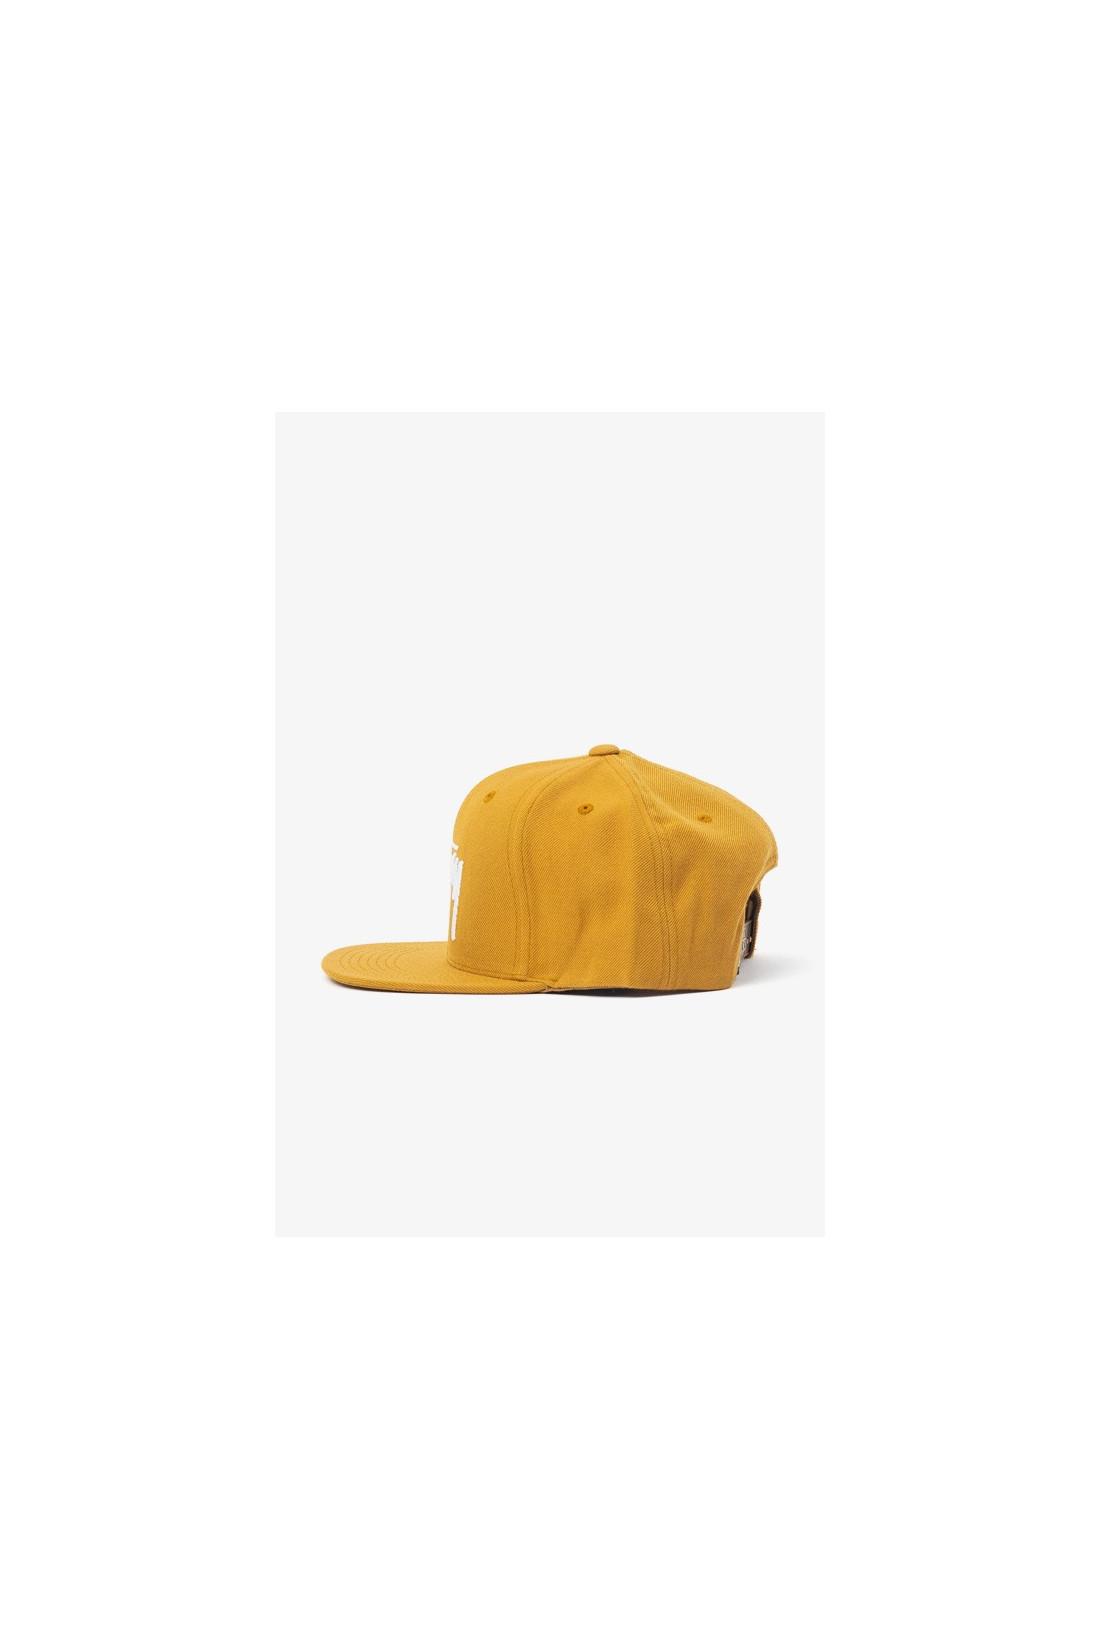 STUSSY / Stock cap Mustard